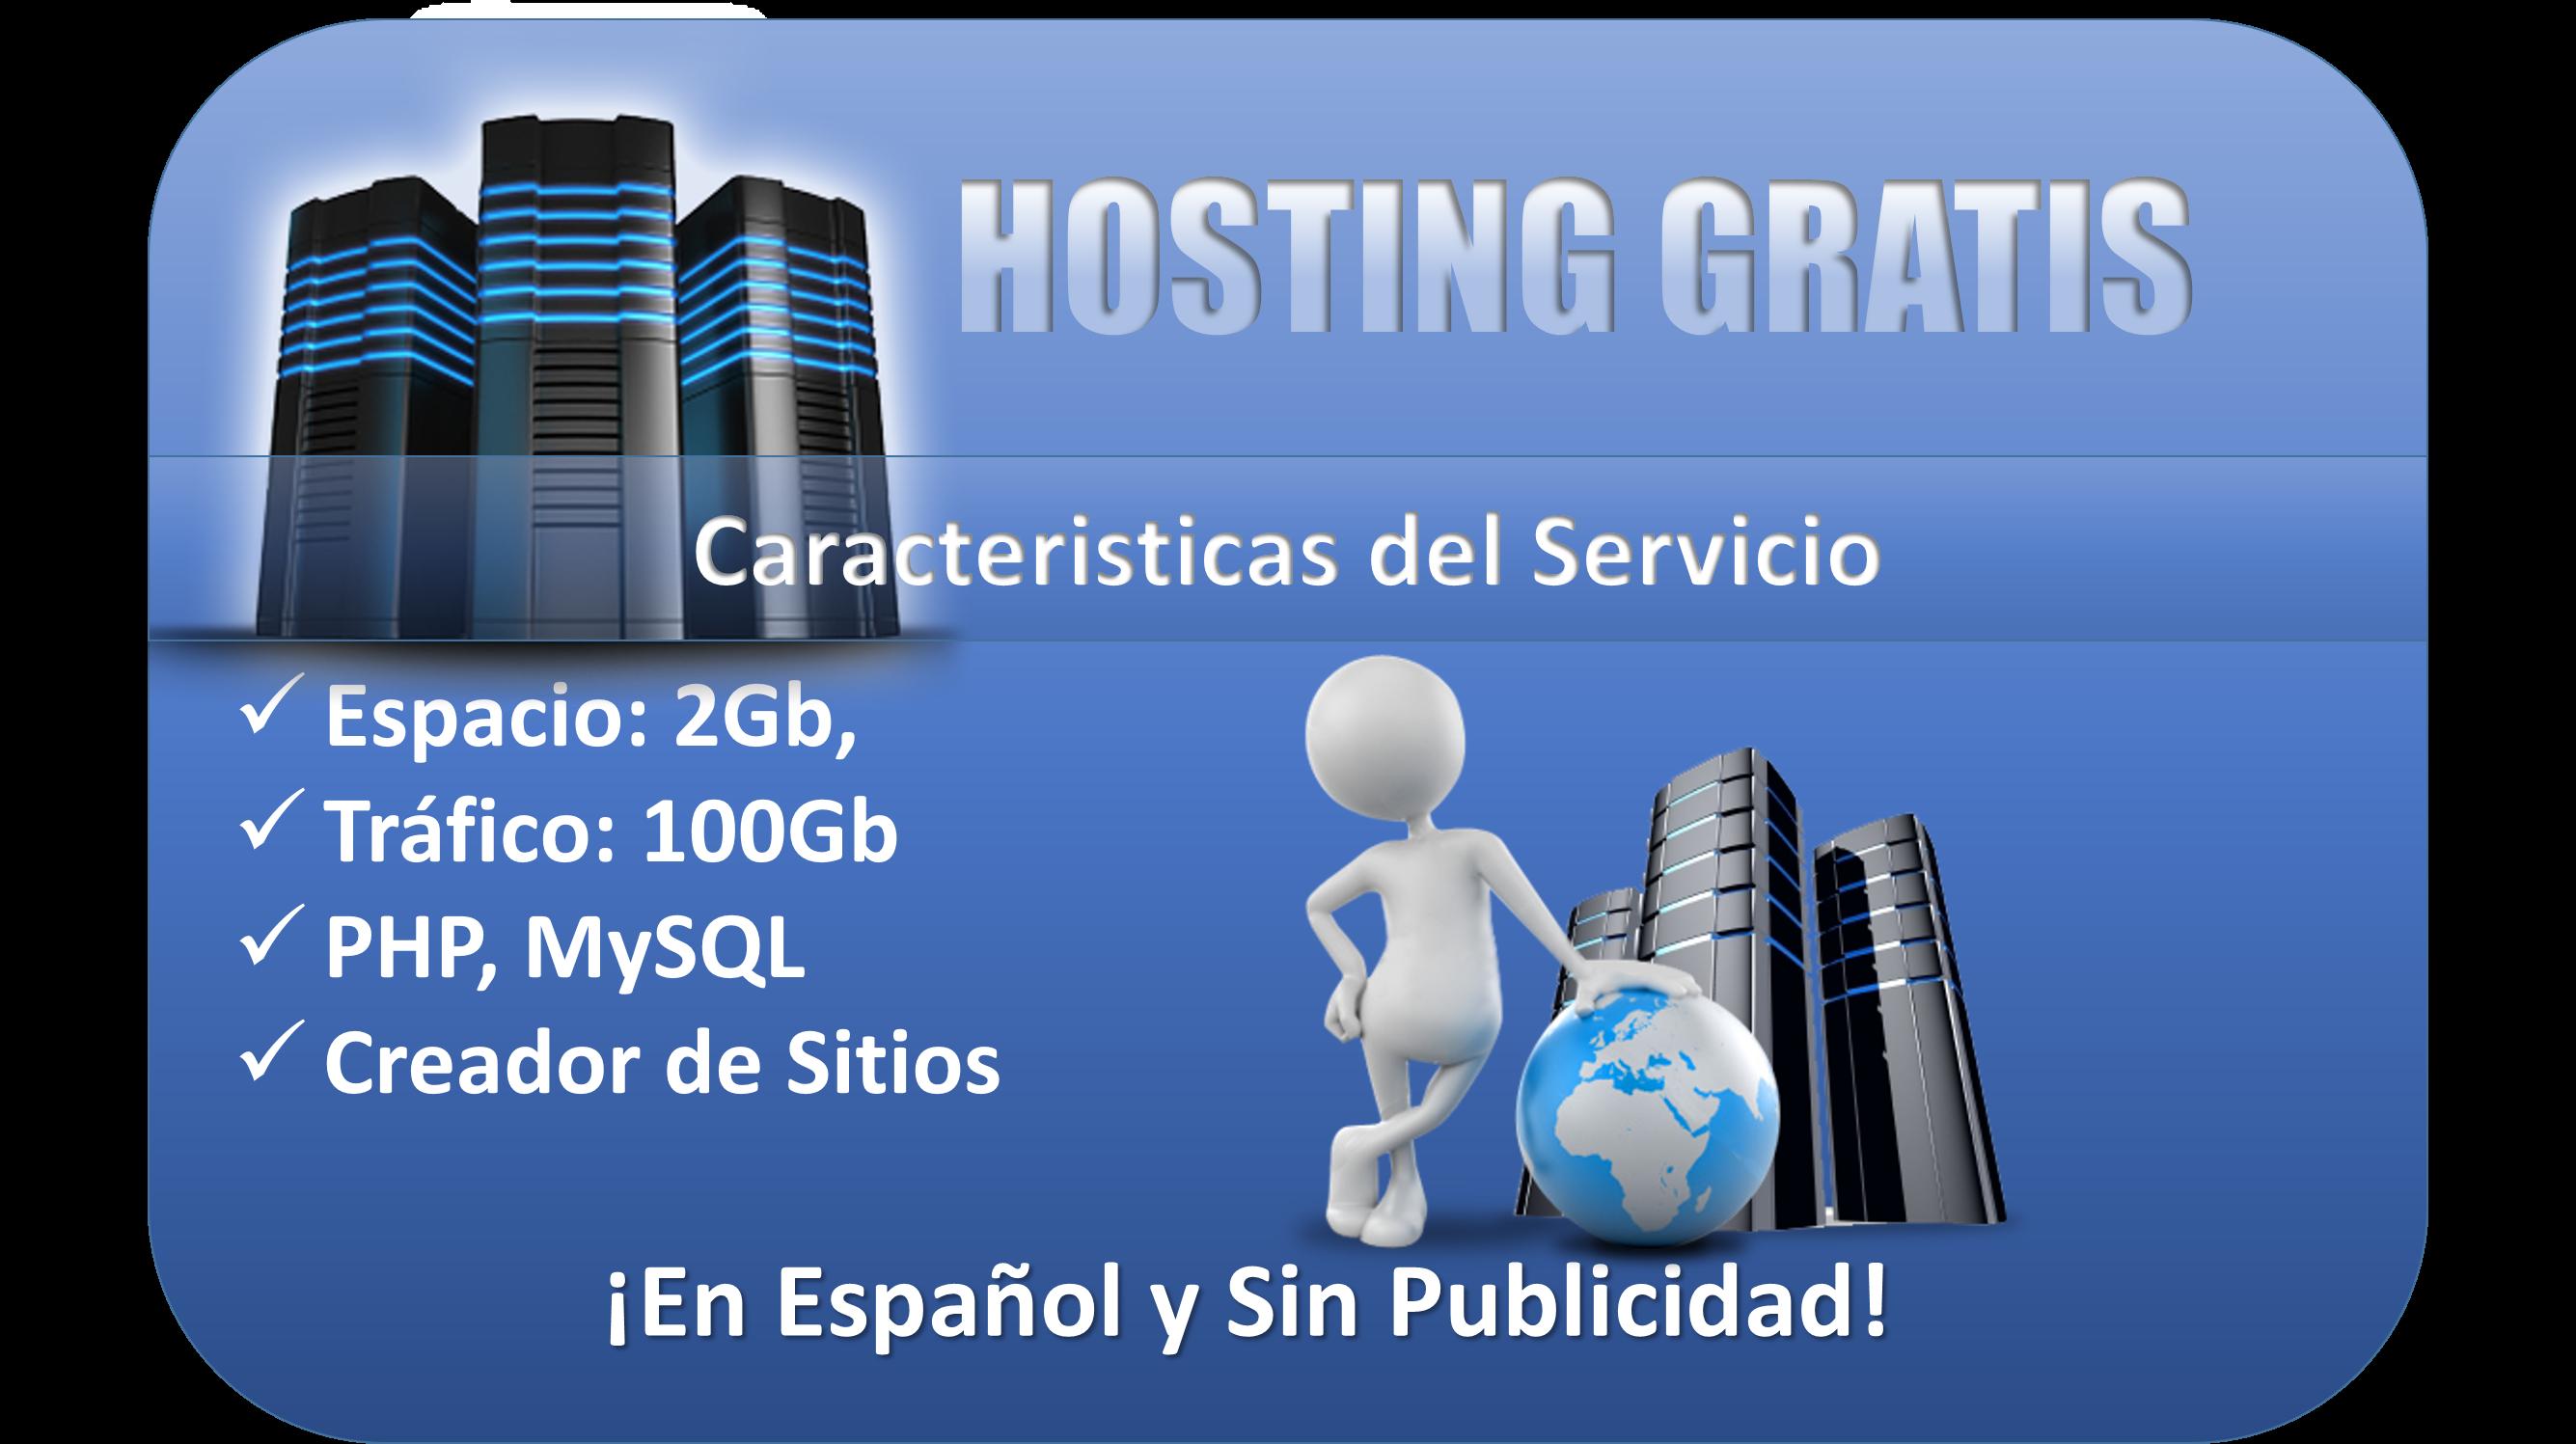 Hosting Gratis0 (0)